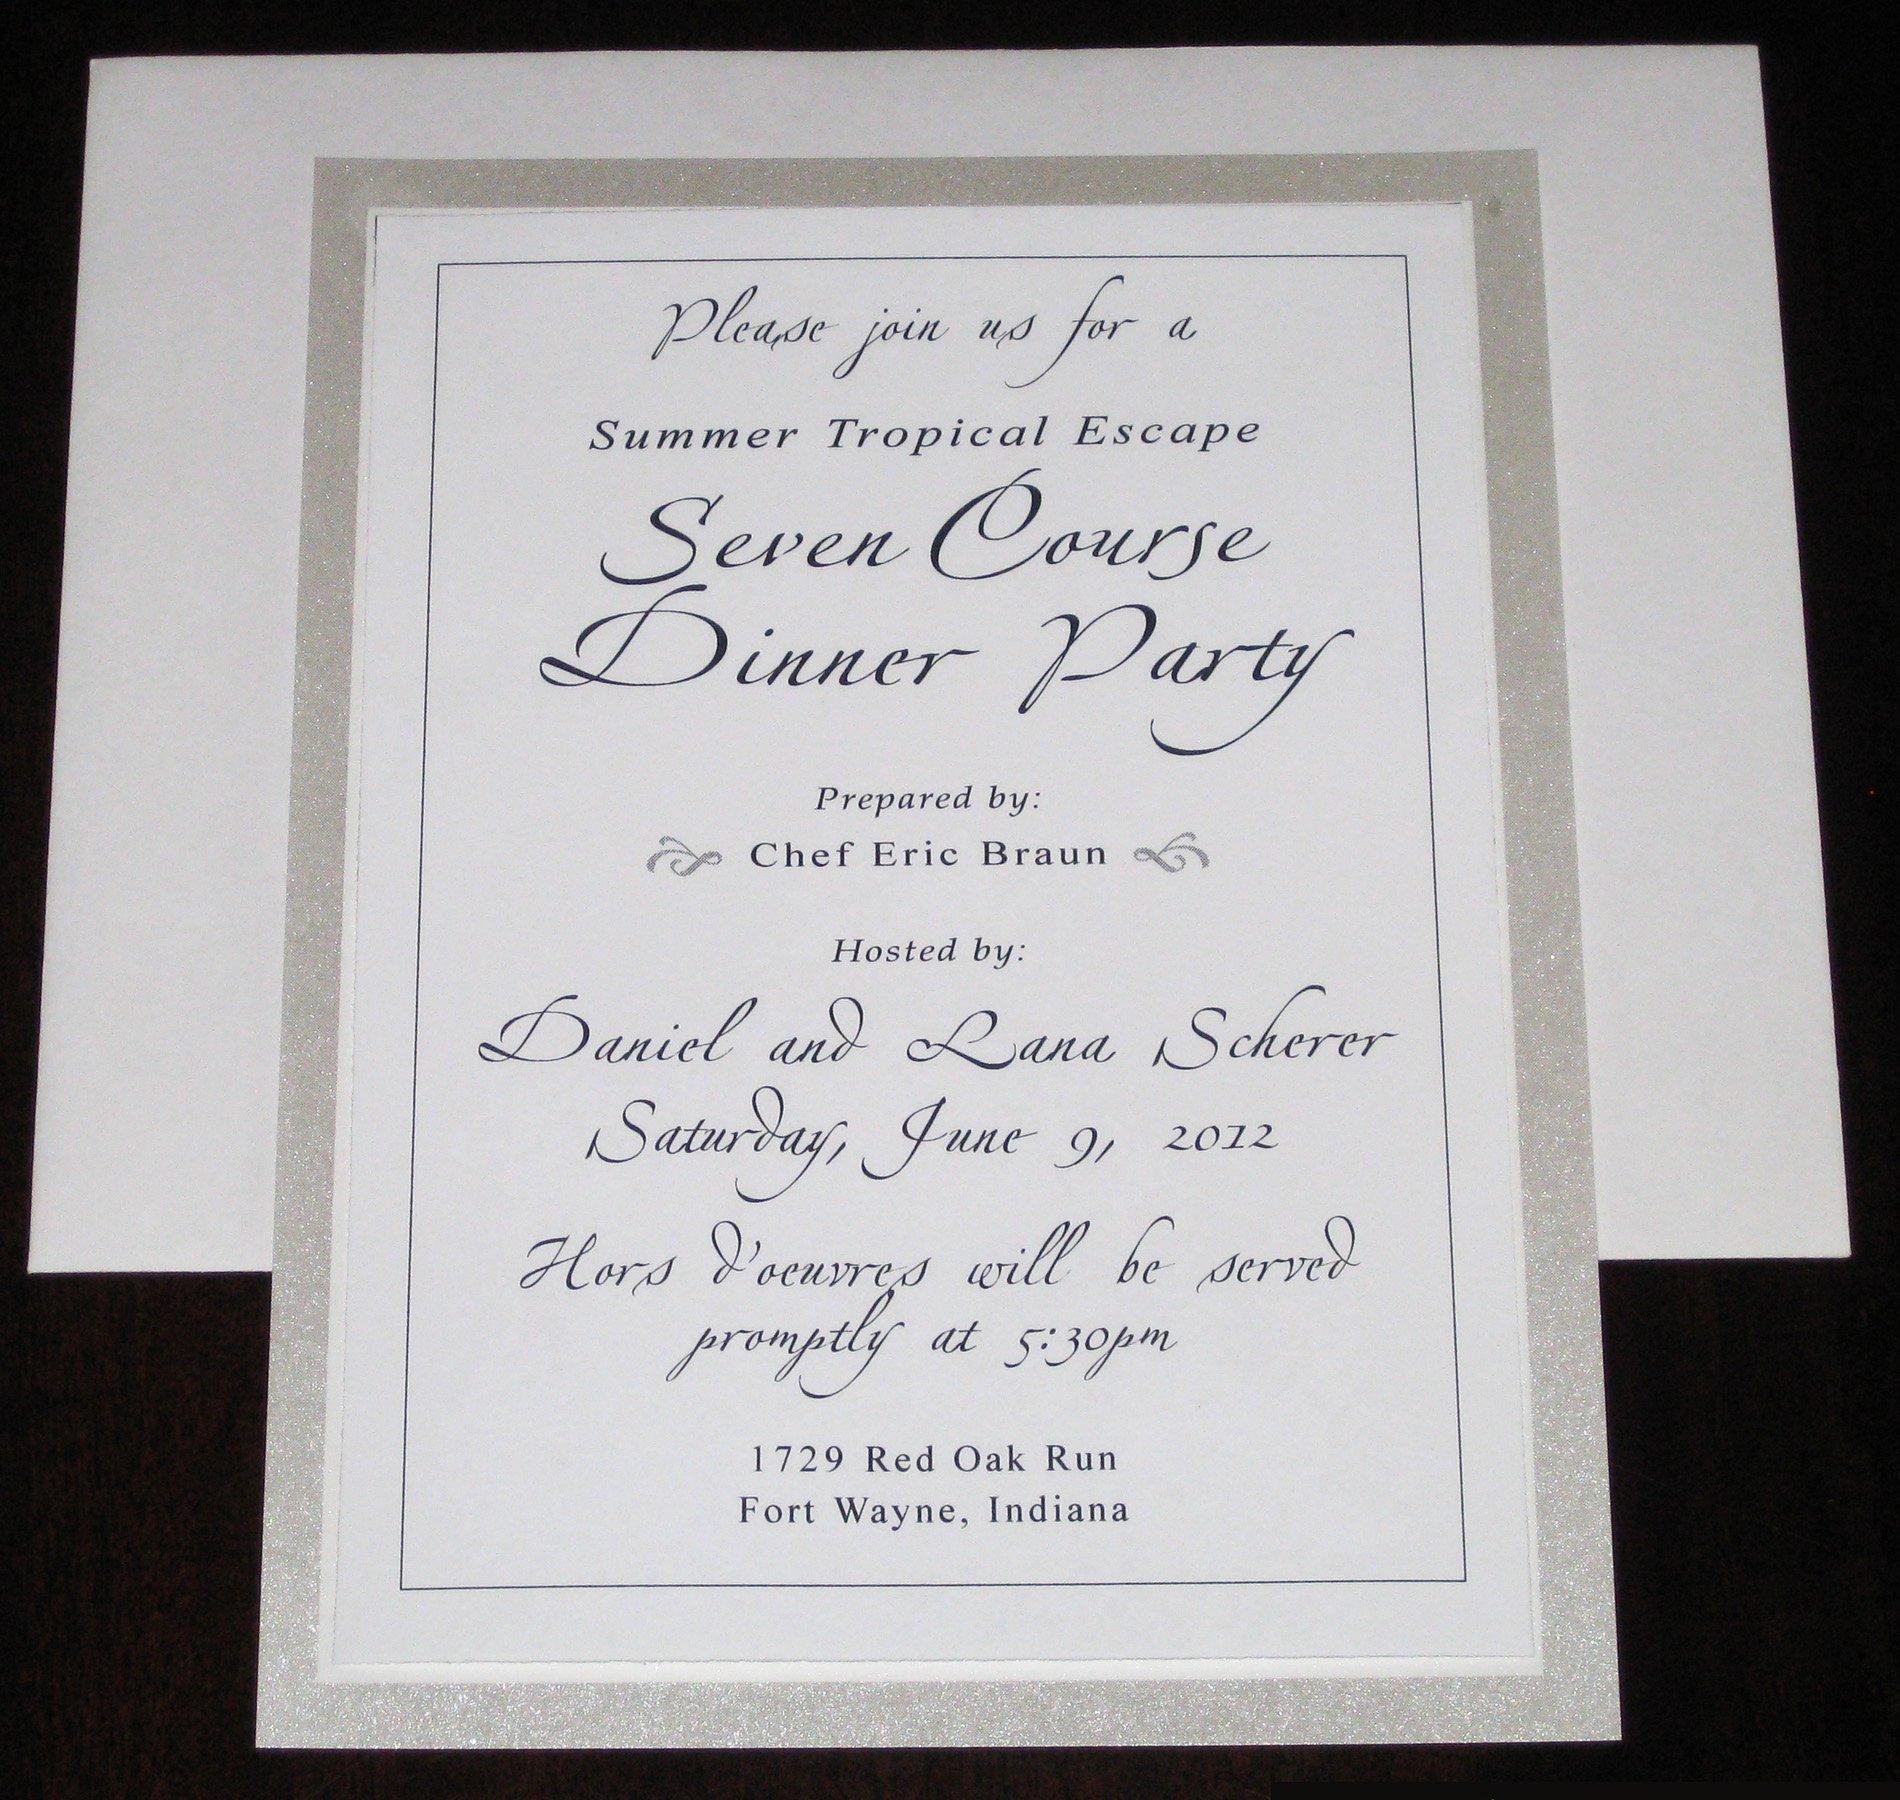 Formal Dinner Invitation Wording Lovely formal Dinner Invitation Wording Samples